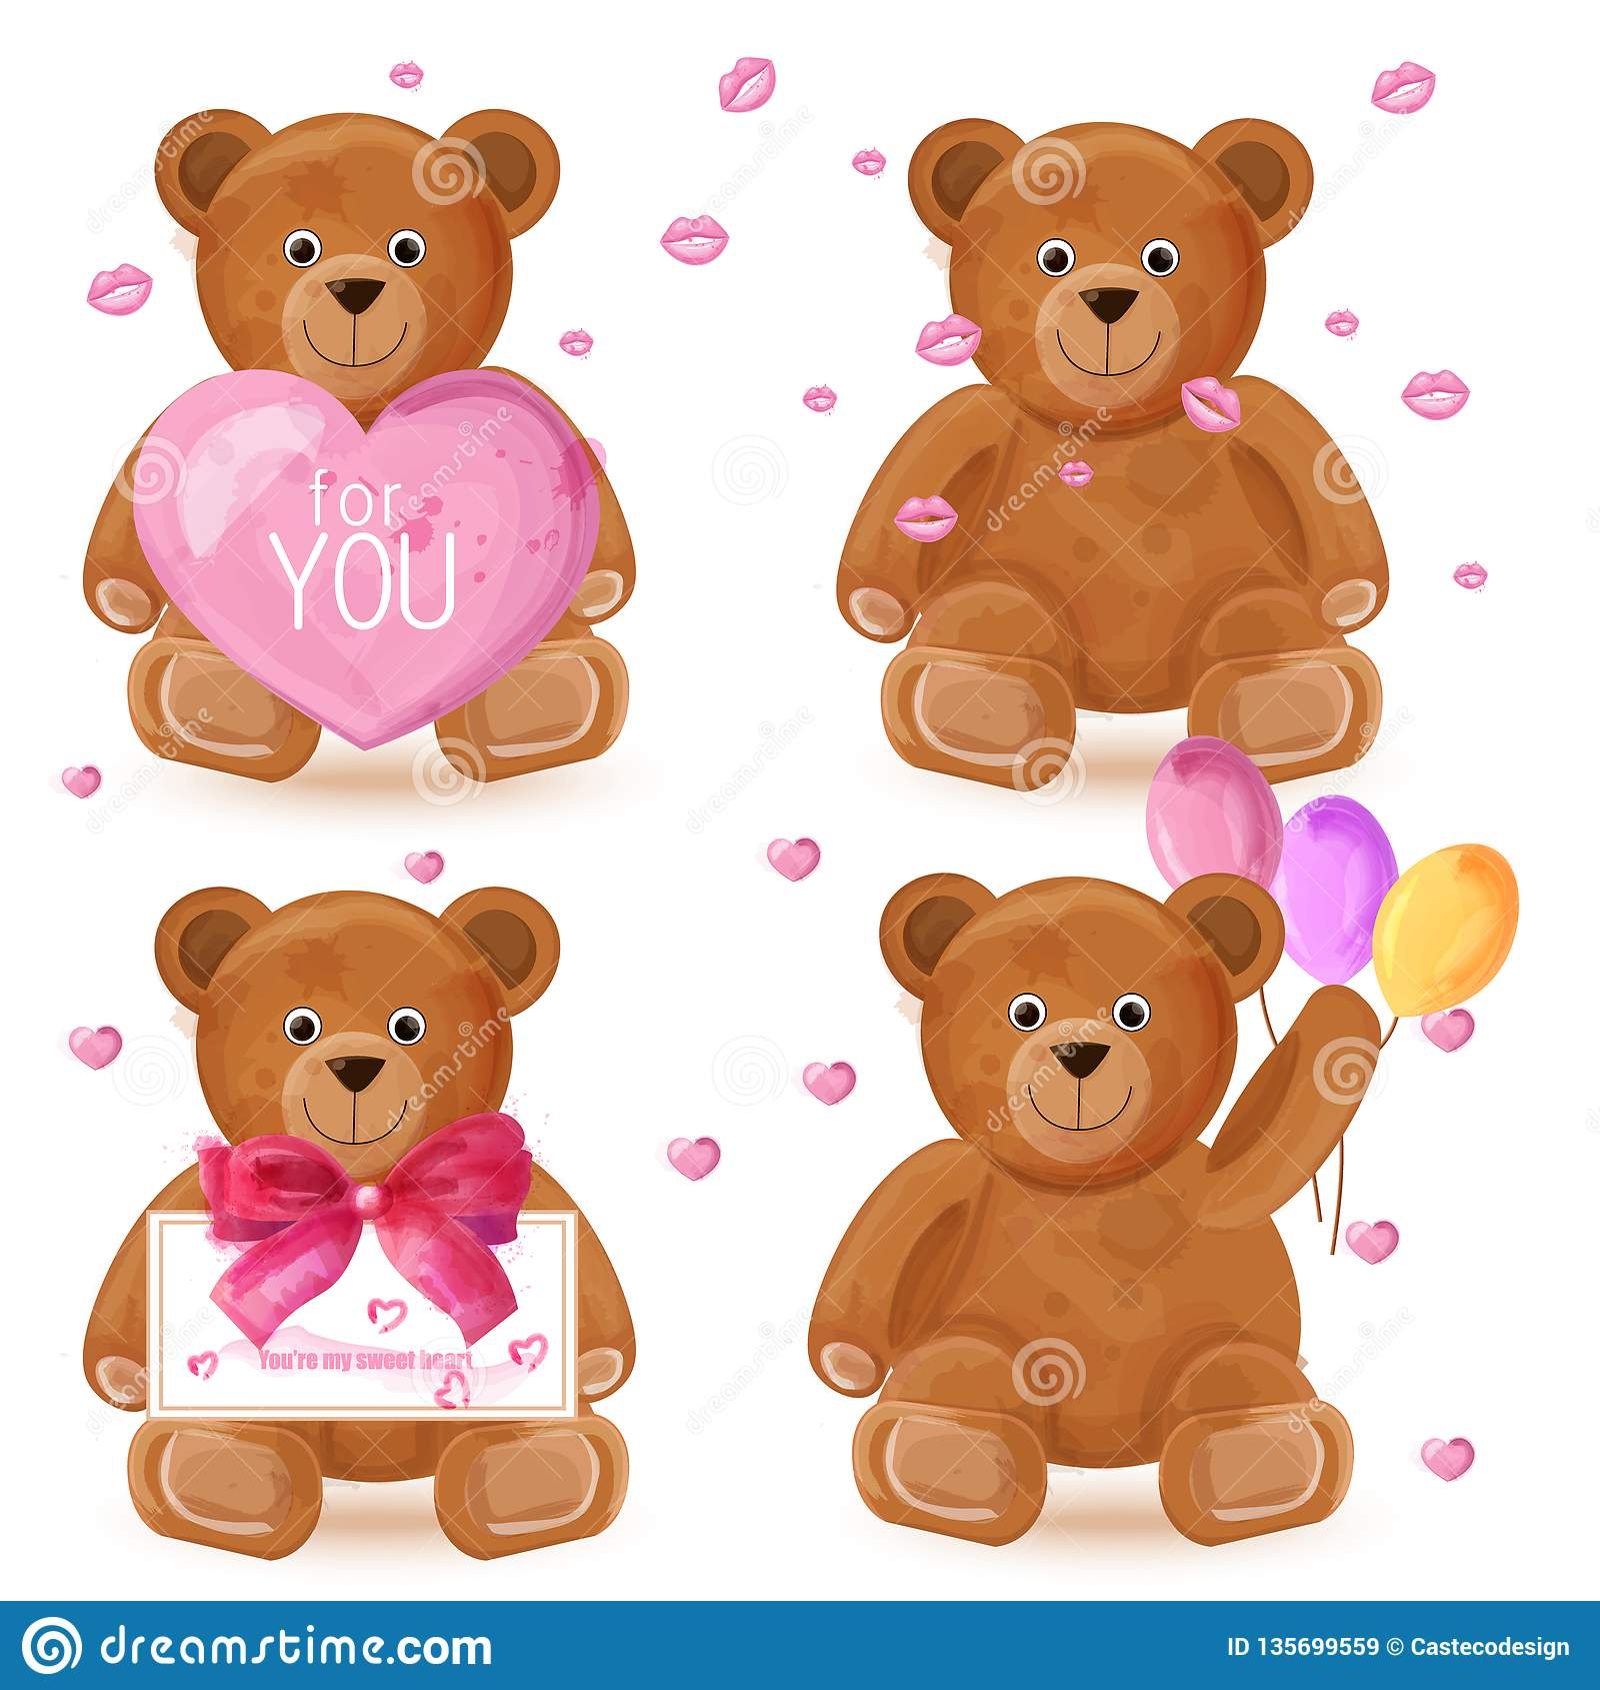 Teddy bear set Vector. Romantic cute cartoon bears lovely symbols in watercolor